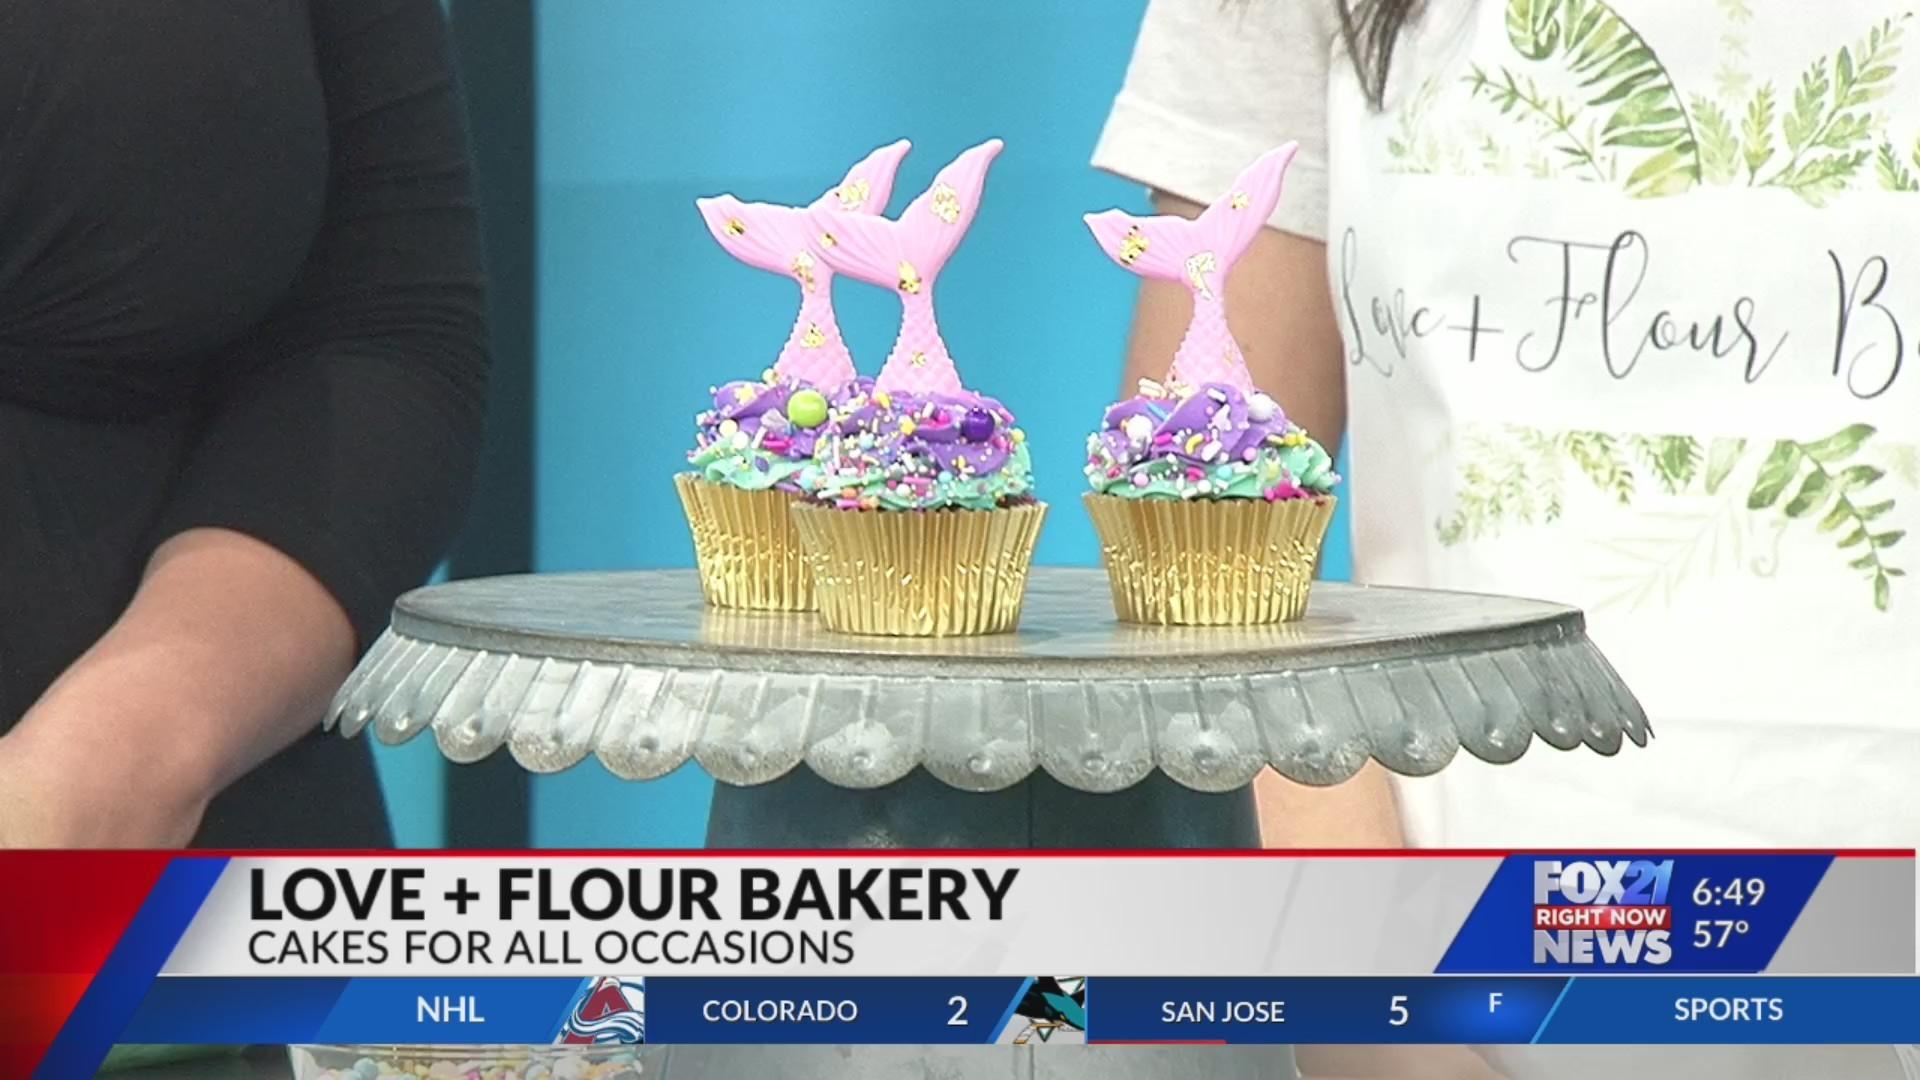 Love + Flour Bakery Part 1